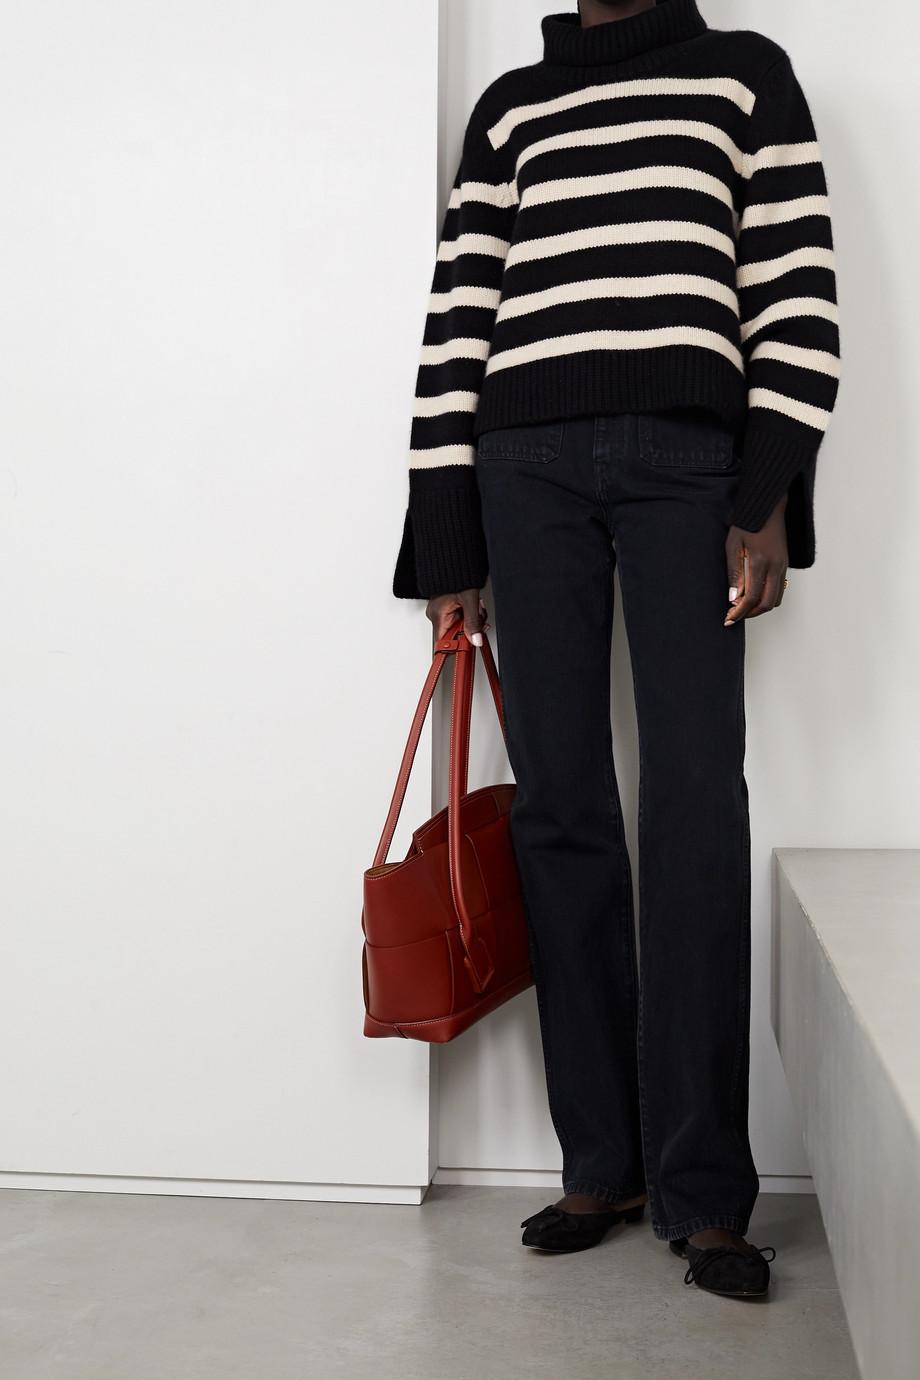 Khaite Marion striped cashmere turtleneck sweater